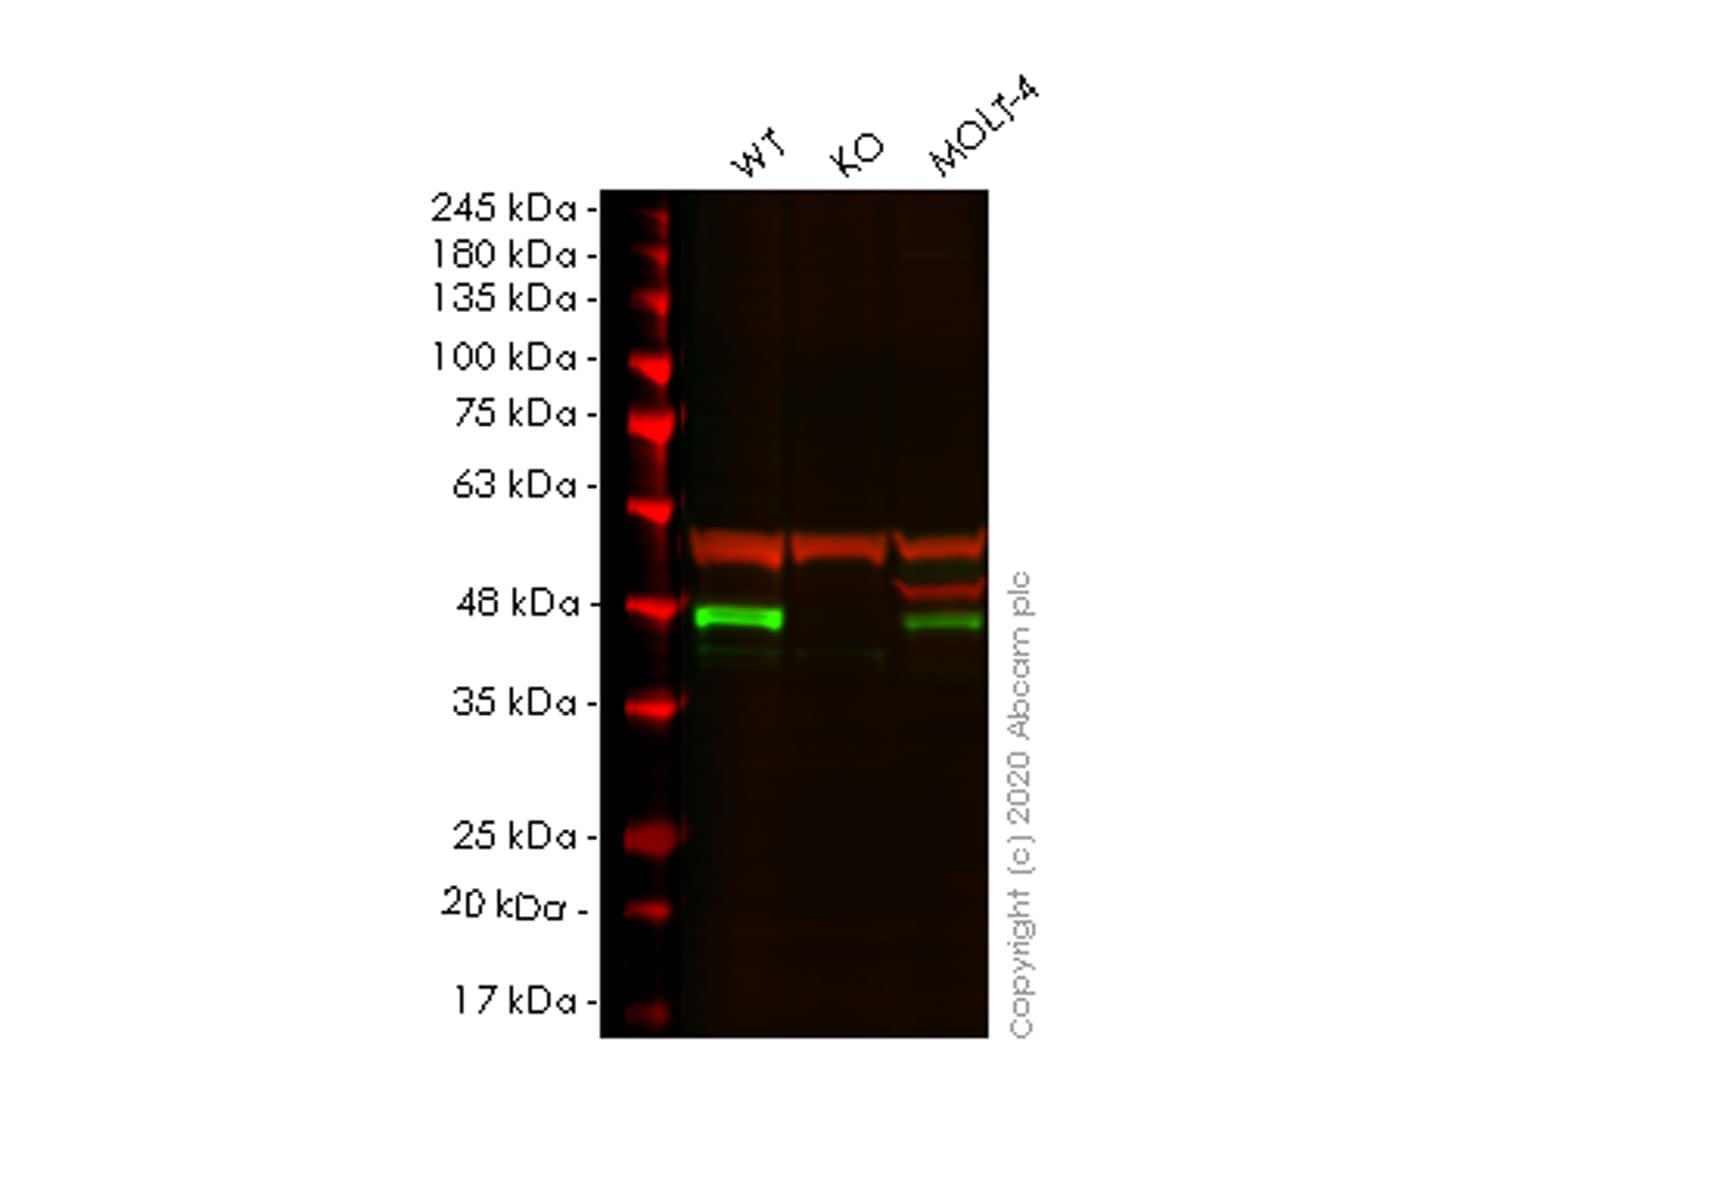 Western blot - Anti-Bmi1 antibody [EPR3745(2)] - BSA and Azide free (ab216444)